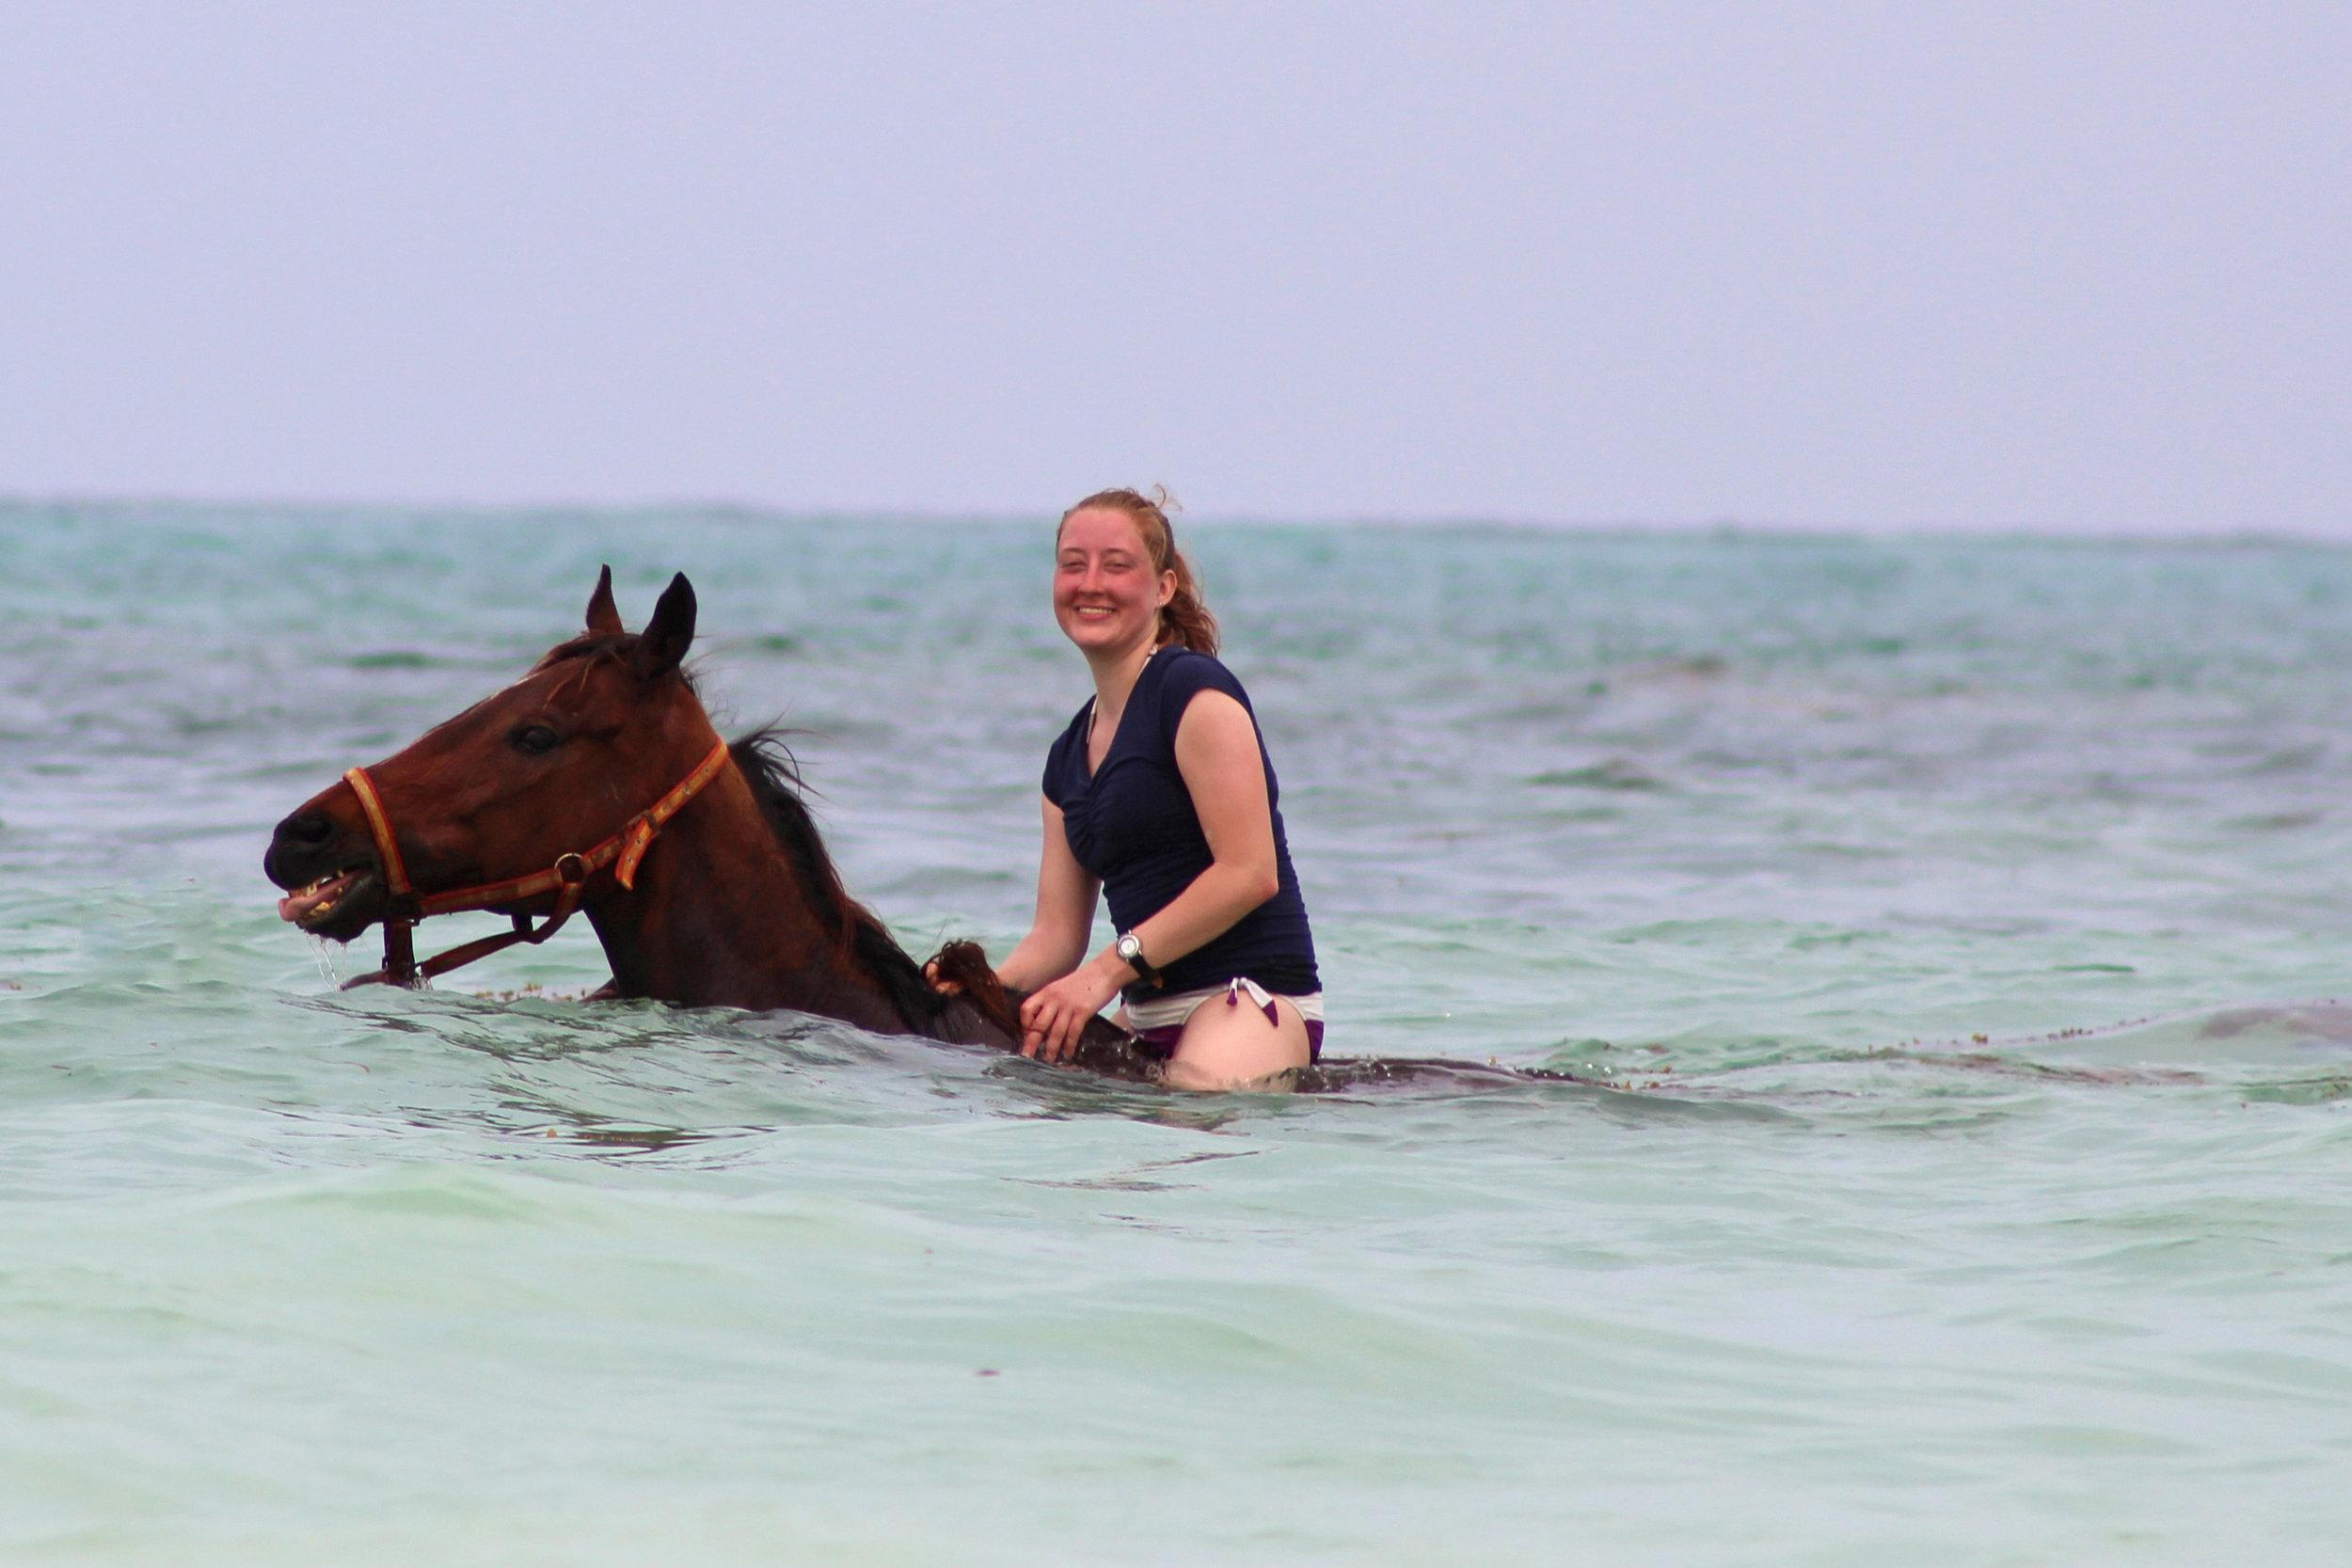 Swimming on horseback in the ocean in Kiwengwa, Zanzibar.